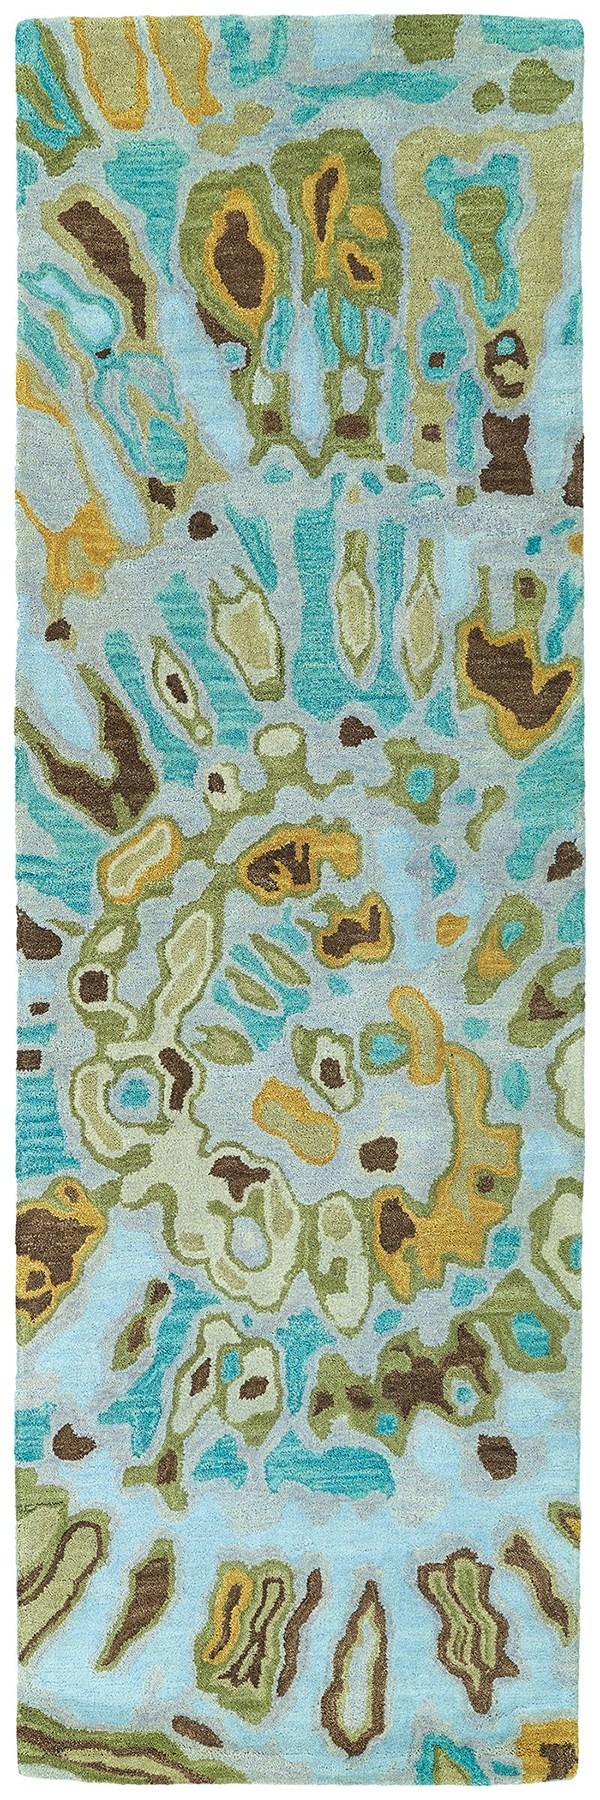 Teal, Chocolate, Mustard (91) Contemporary / Modern Area Rug